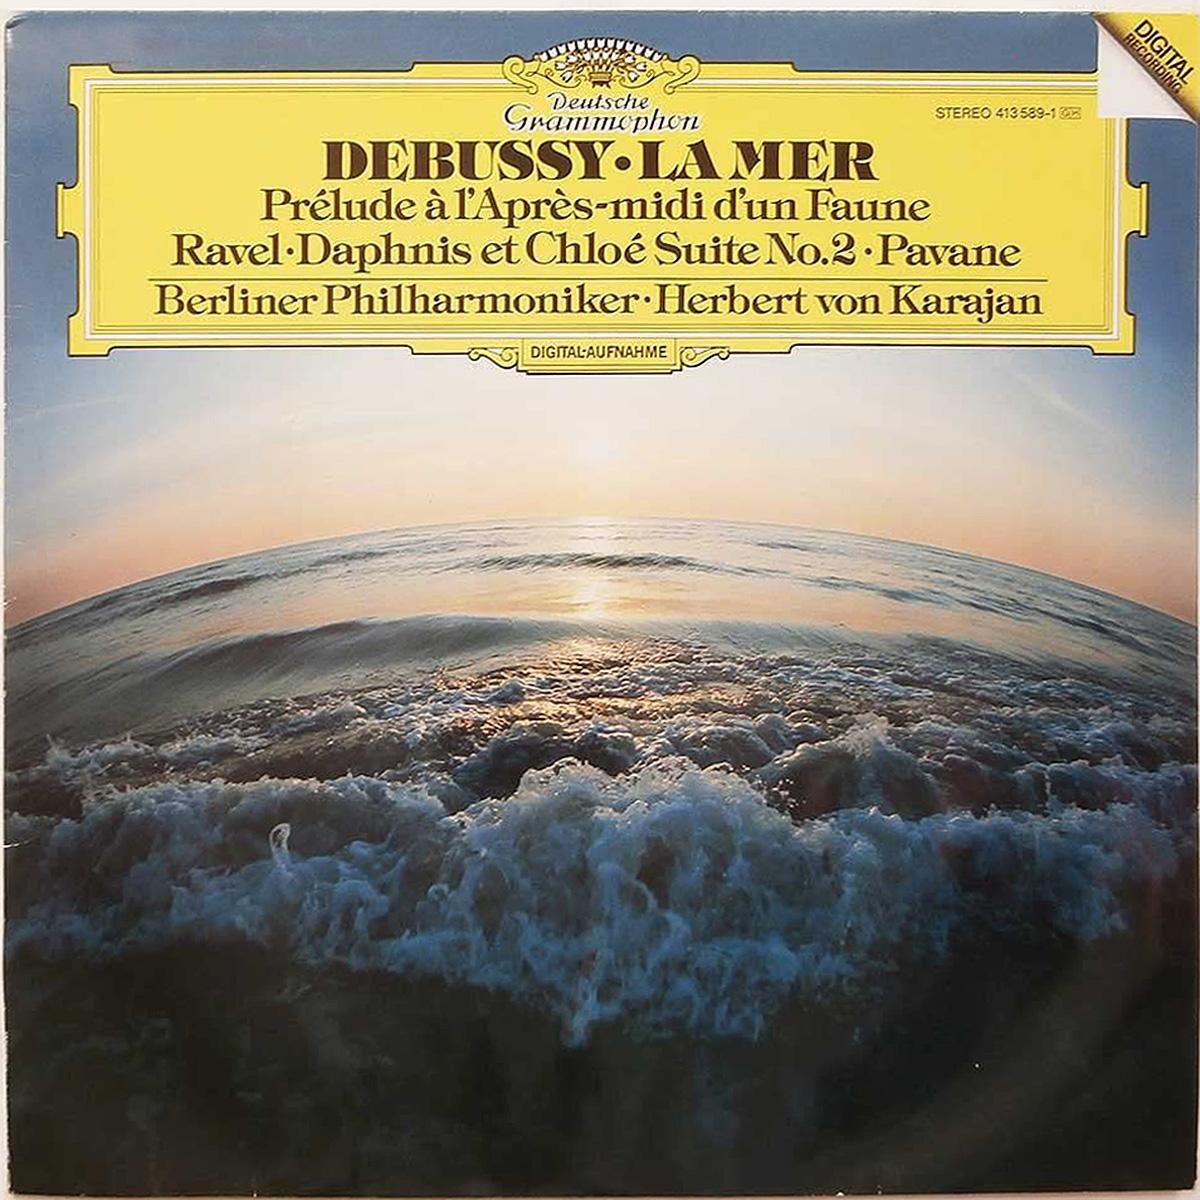 DGG 413 589 Debussy Mer Prelude Pavane Ravel Paphnis Karajan DGG Digital Aufnahme